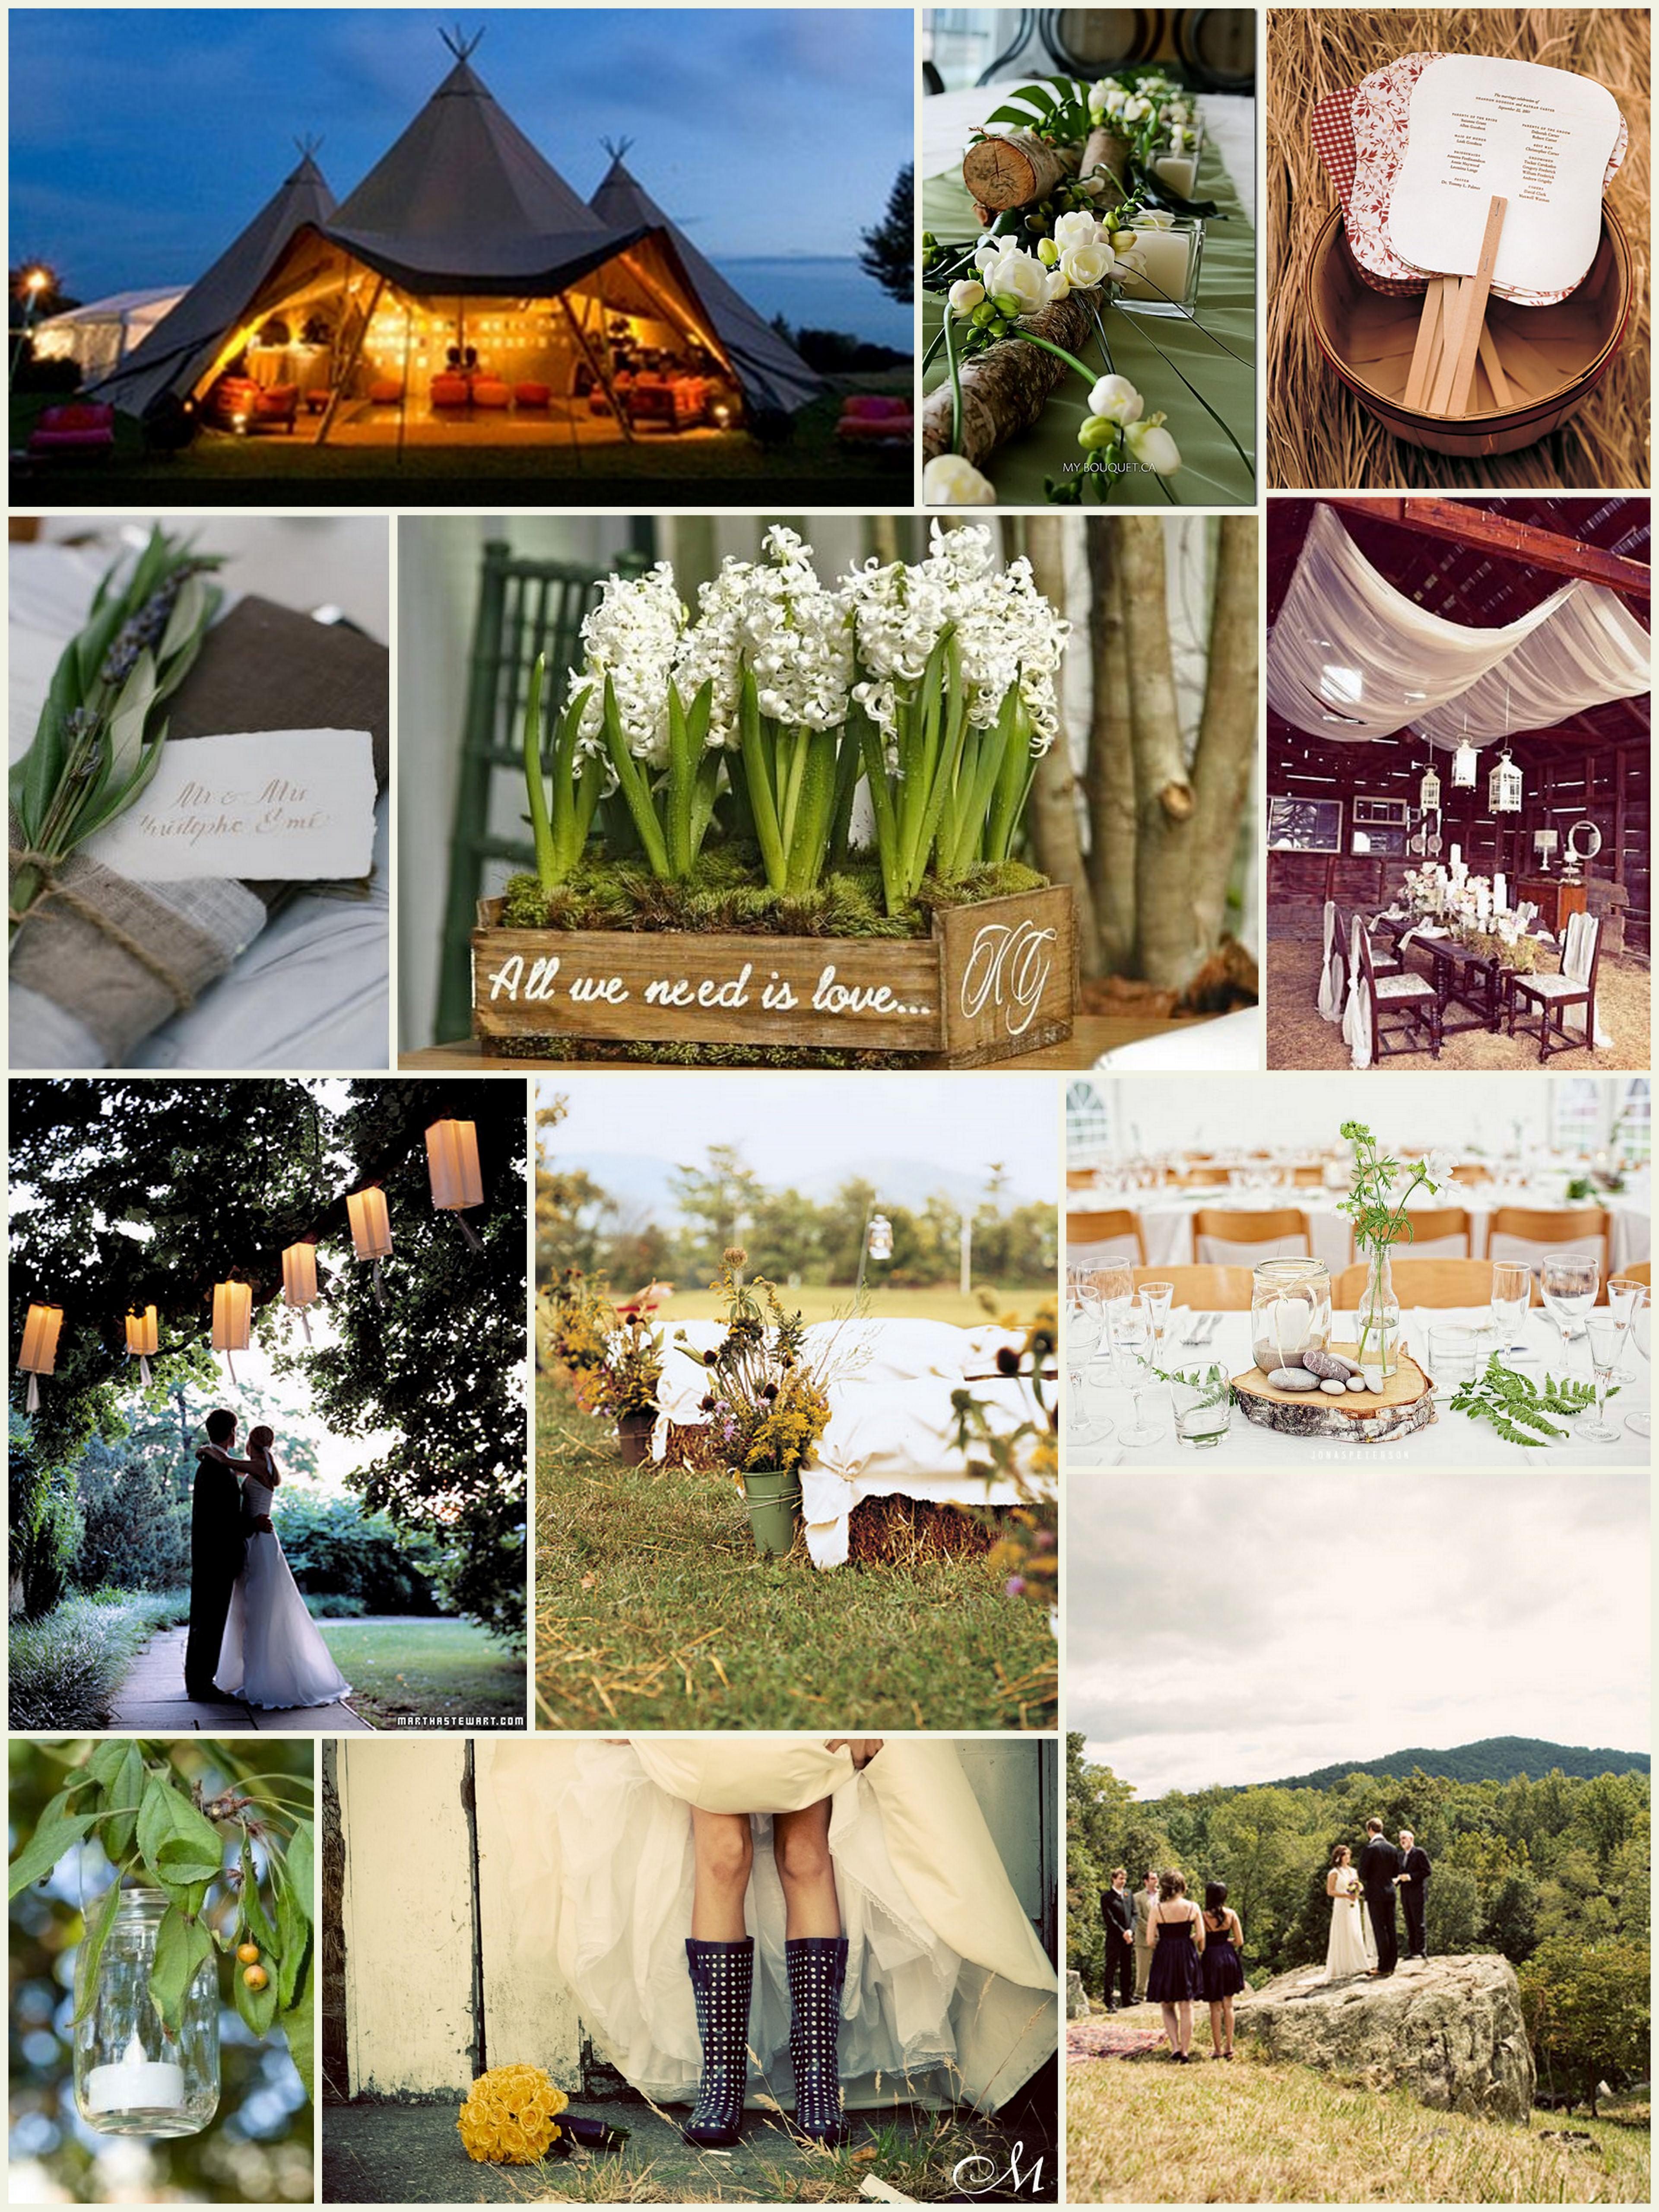 Outdoor wedding inspiration board boho weddings for the for Outdoor wedding theme ideas